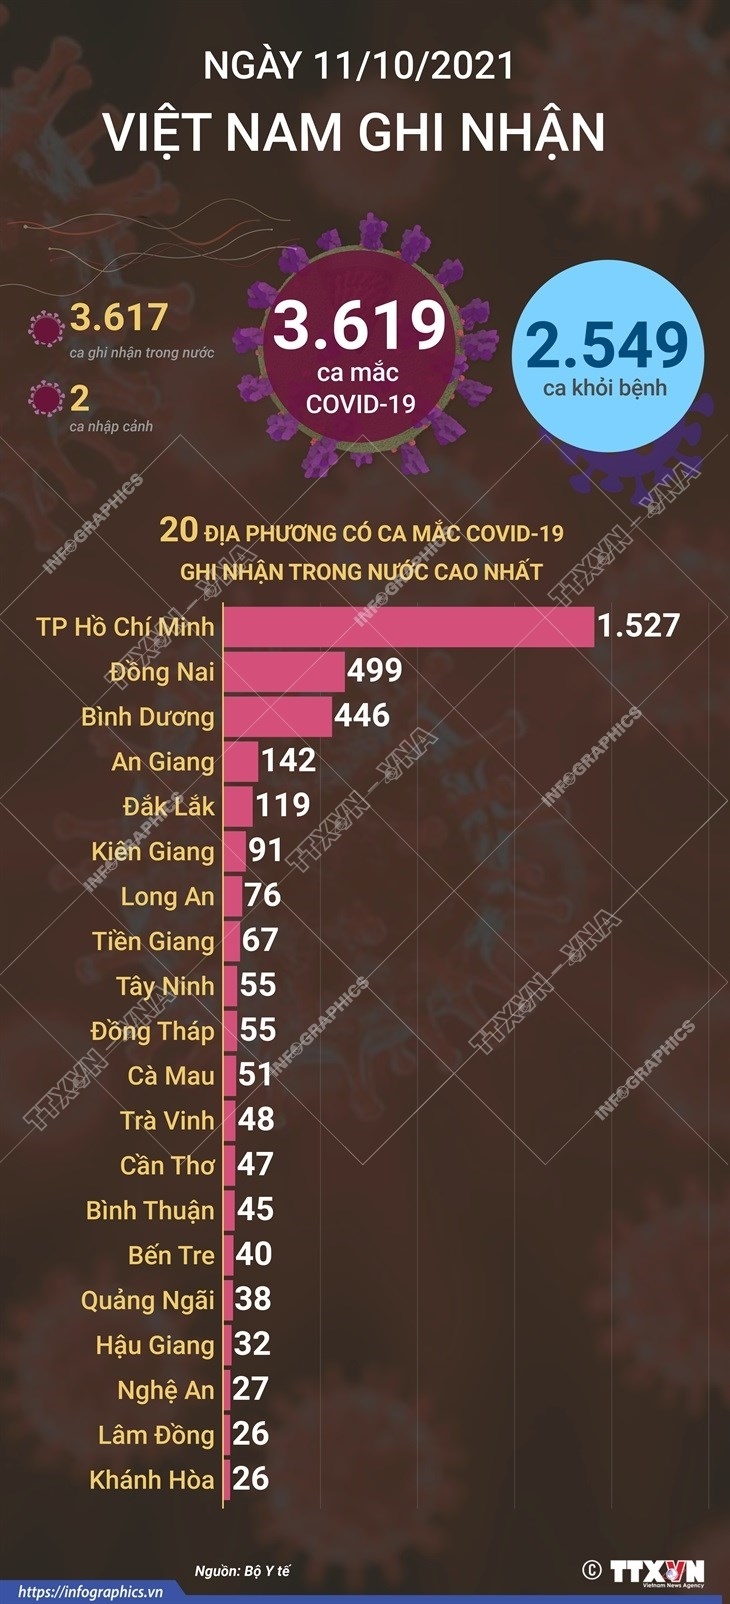 Ngay 11/10, Viet Nam ghi nhan 3.619 ca mac moi, 2.549 ca khoi benh hinh anh 1